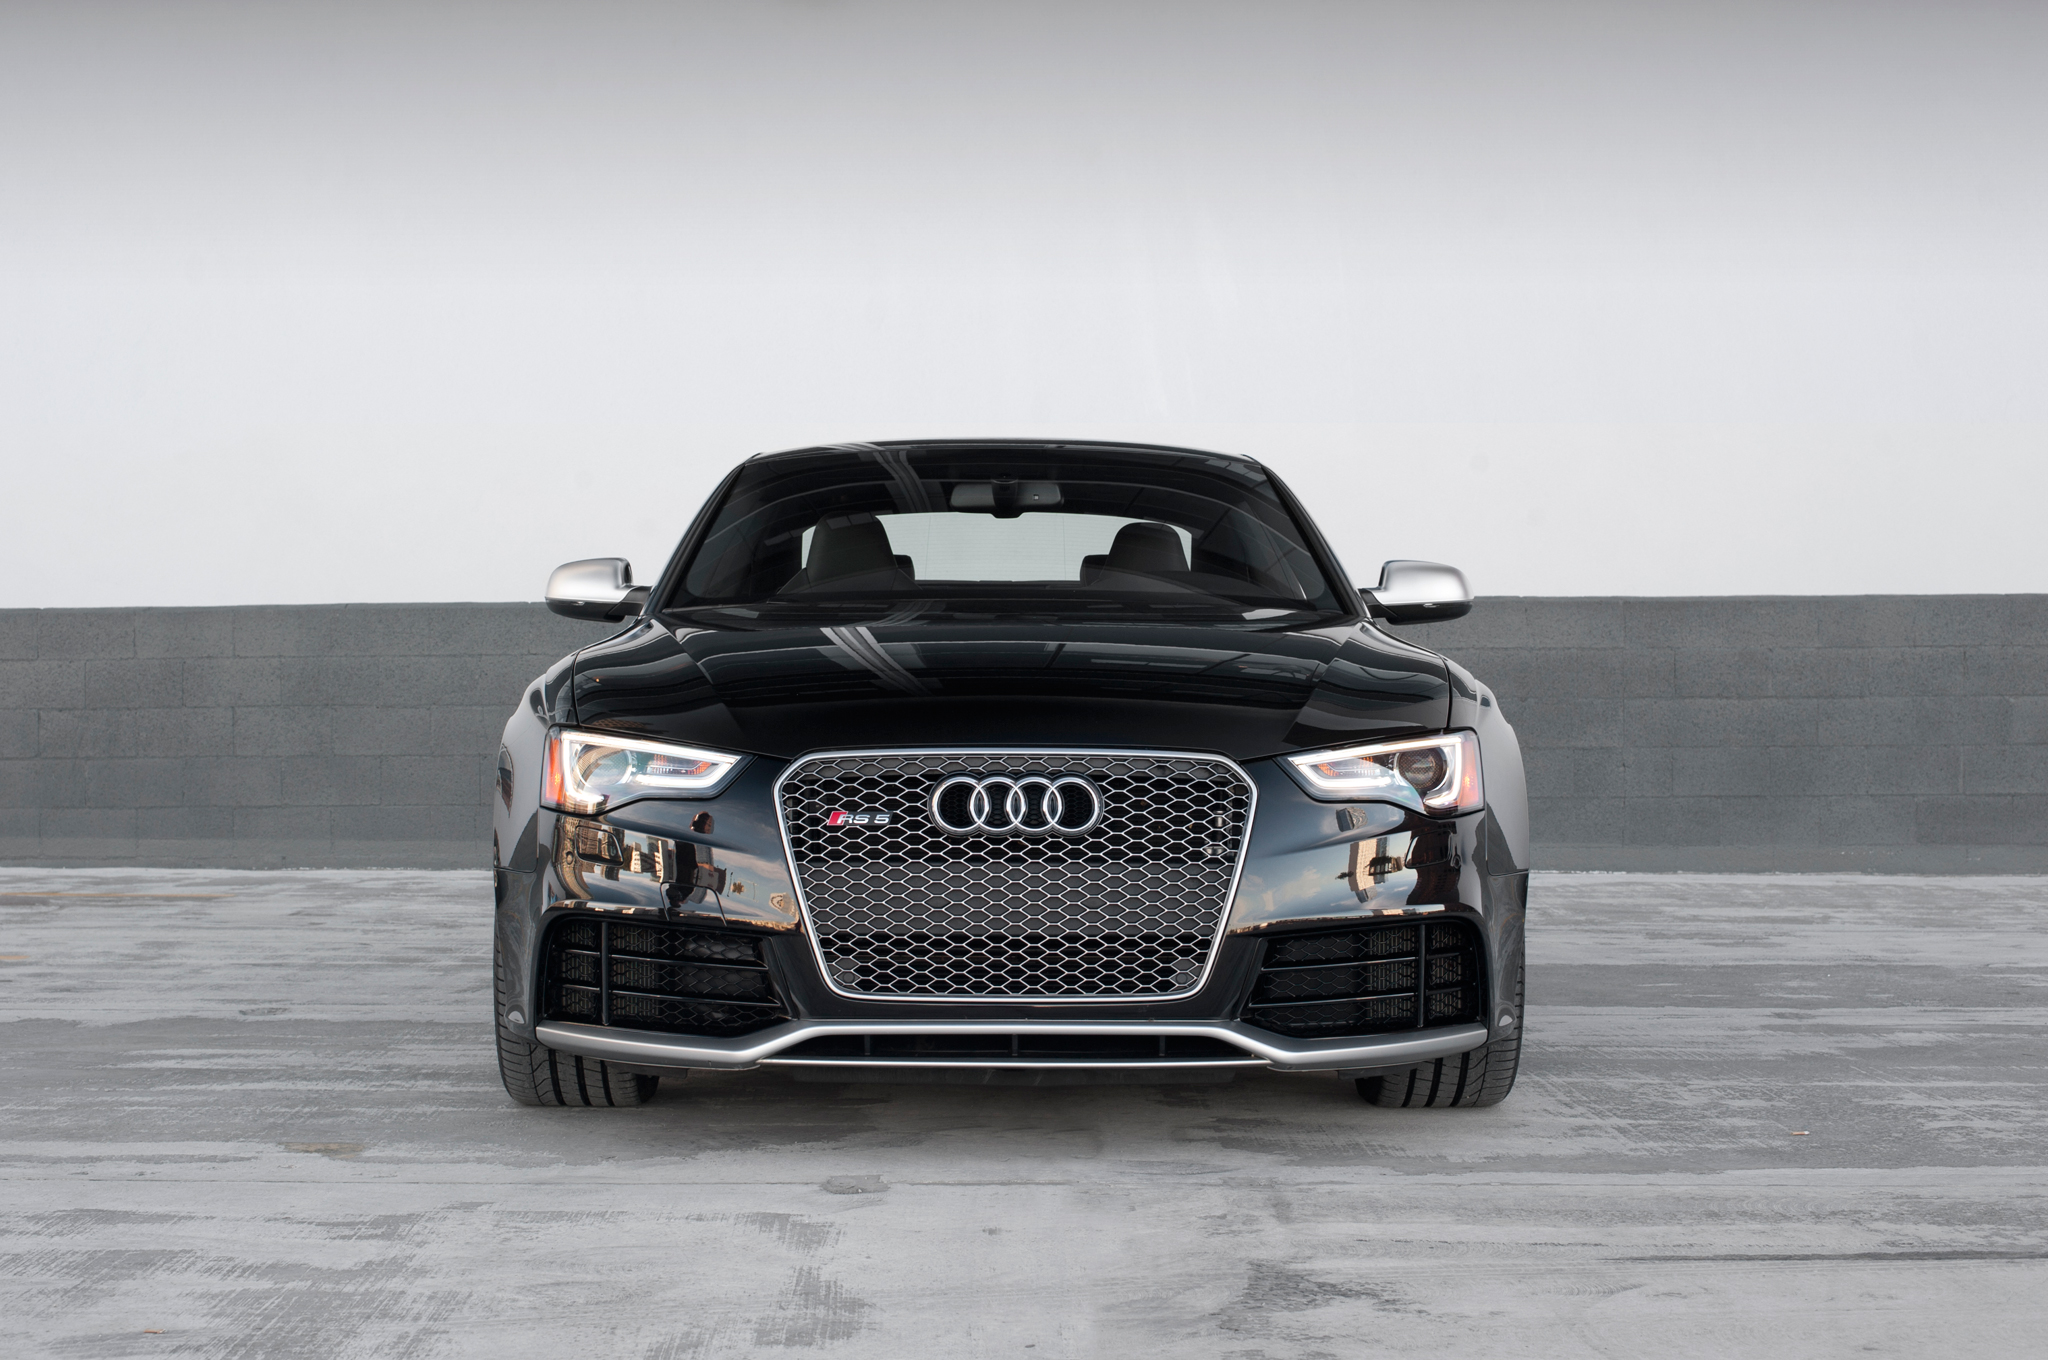 2014 Audi Rs 5 Image 6